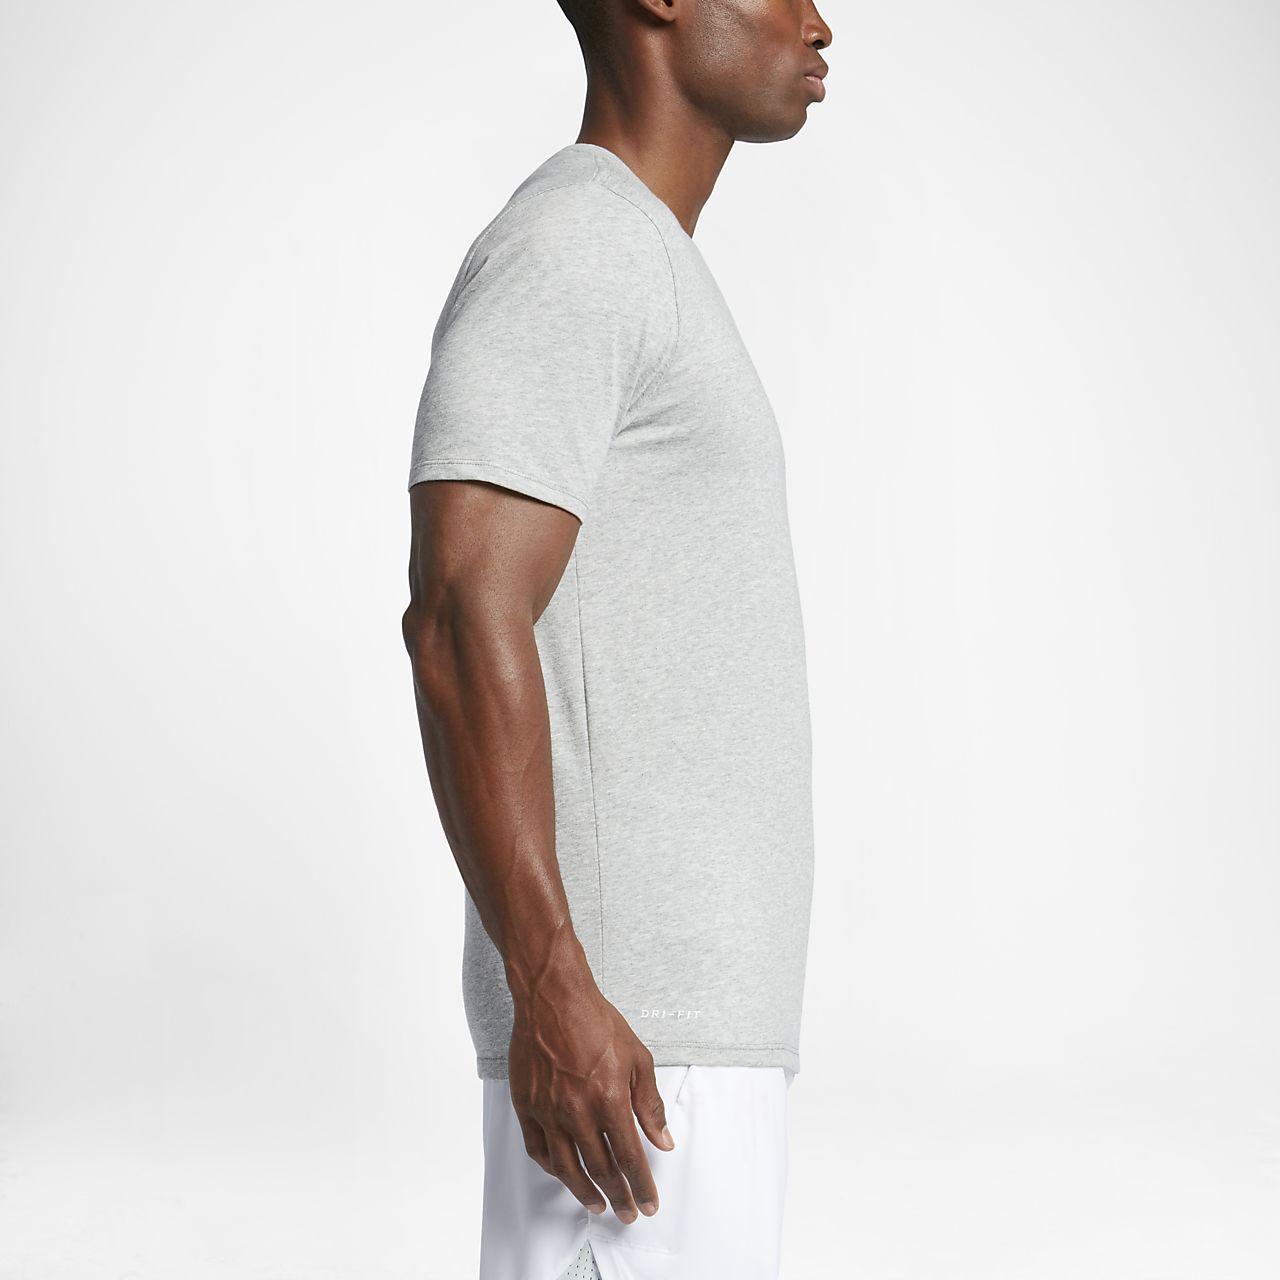 8a9c5fe913ee97 Shirts & Hemden Streetwear Nike Herren Dri-Fit Cotton Kurzarm 2.0 T-Shirt  706625